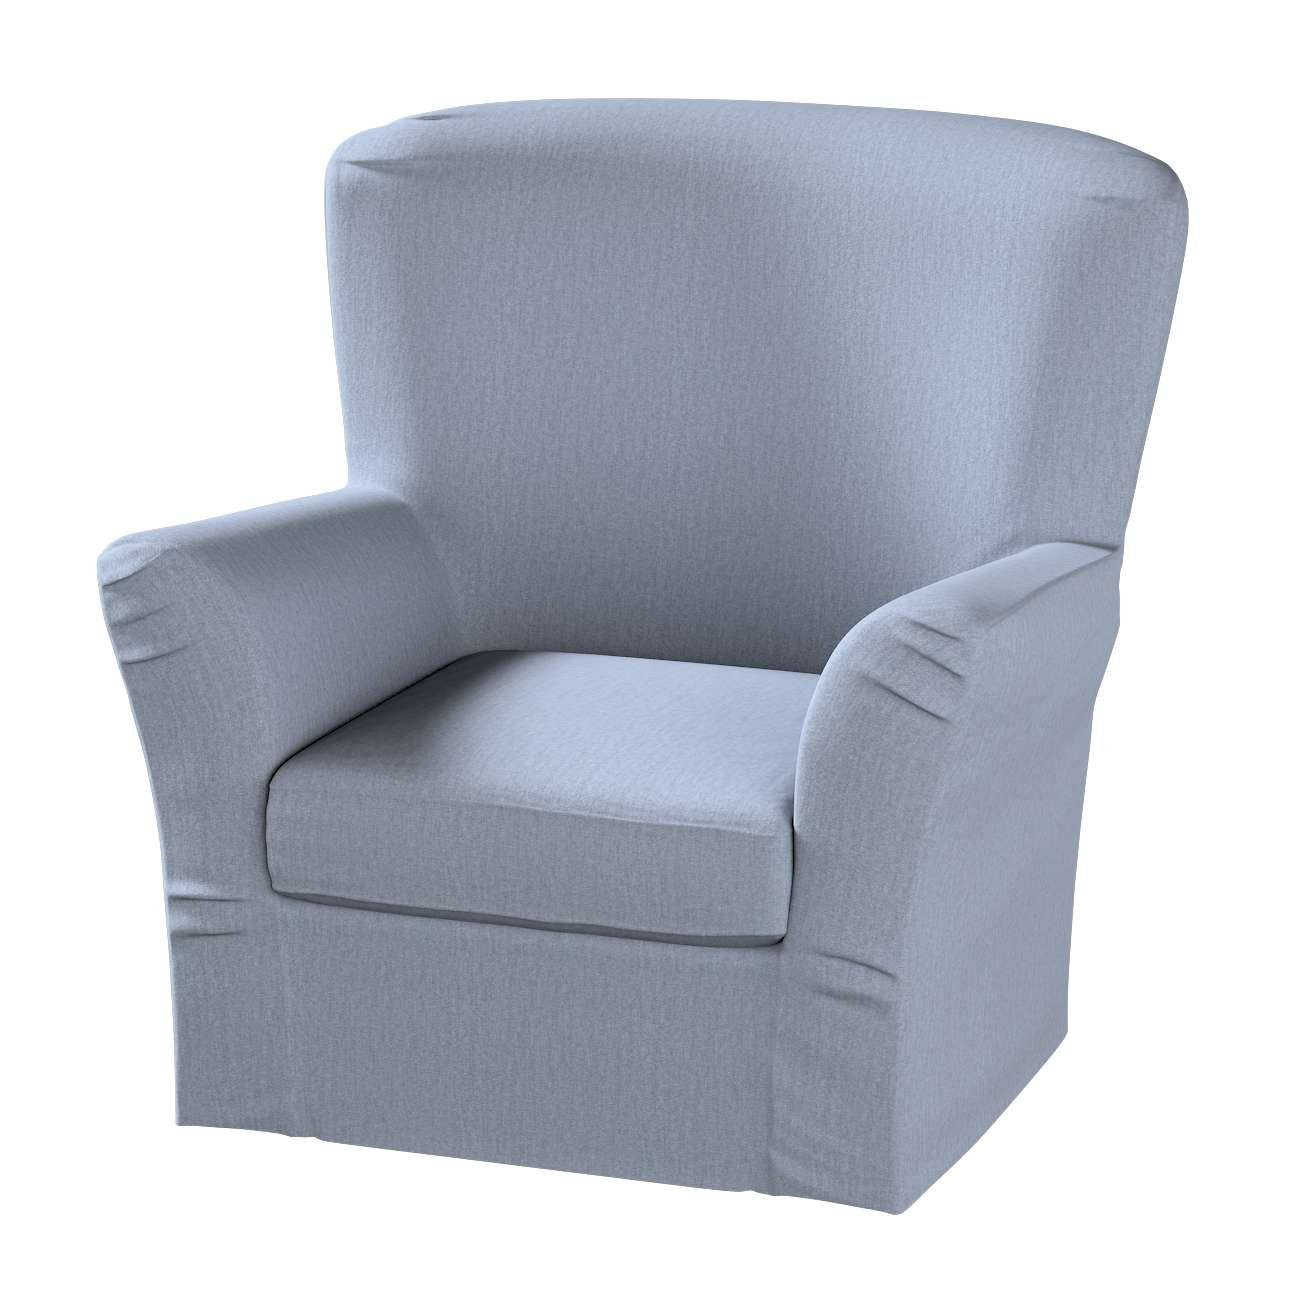 Tomelilla armchair  Tomelilla armchair in collection Chenille, fabric: 702-13